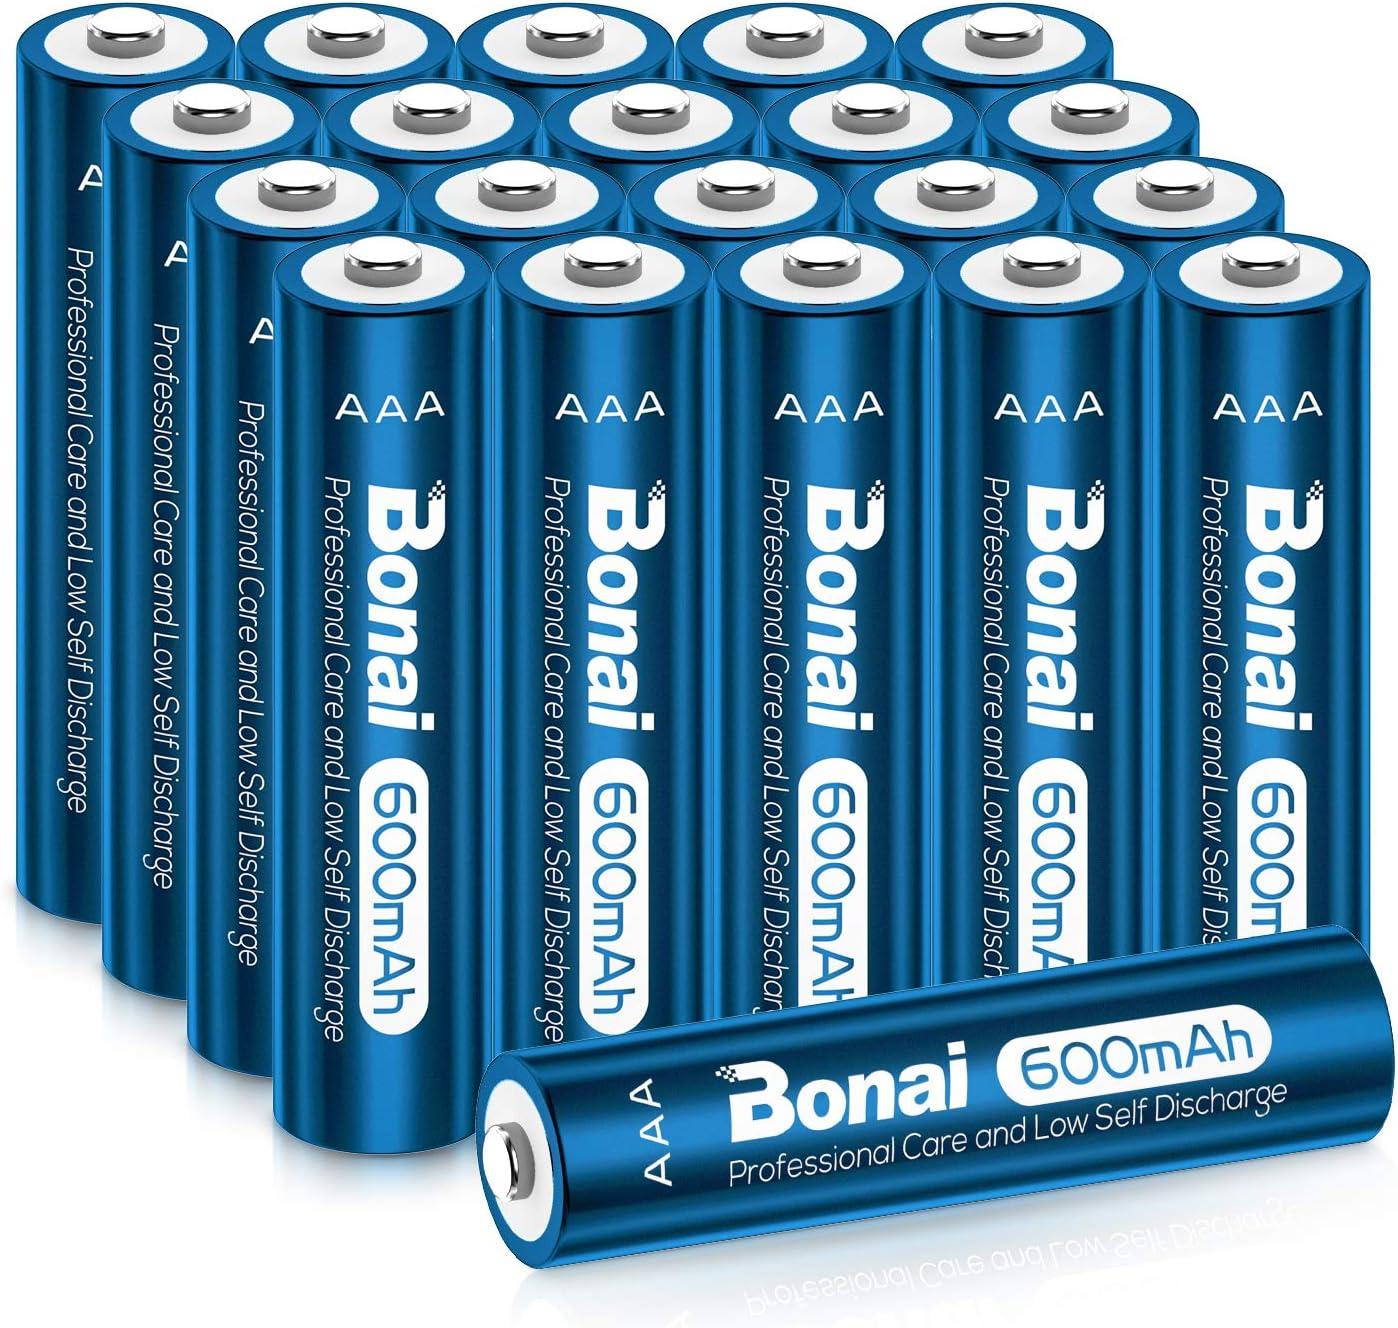 BONAI AAA Rechargeable Batteries 1.2V 600mAh Triple AAA NiMH Battery Solar Batteries for Solar Garden Lights for Solar Lights, Garden Lights, Solar Lamp Anti-Leak (AAA 20 Pack)